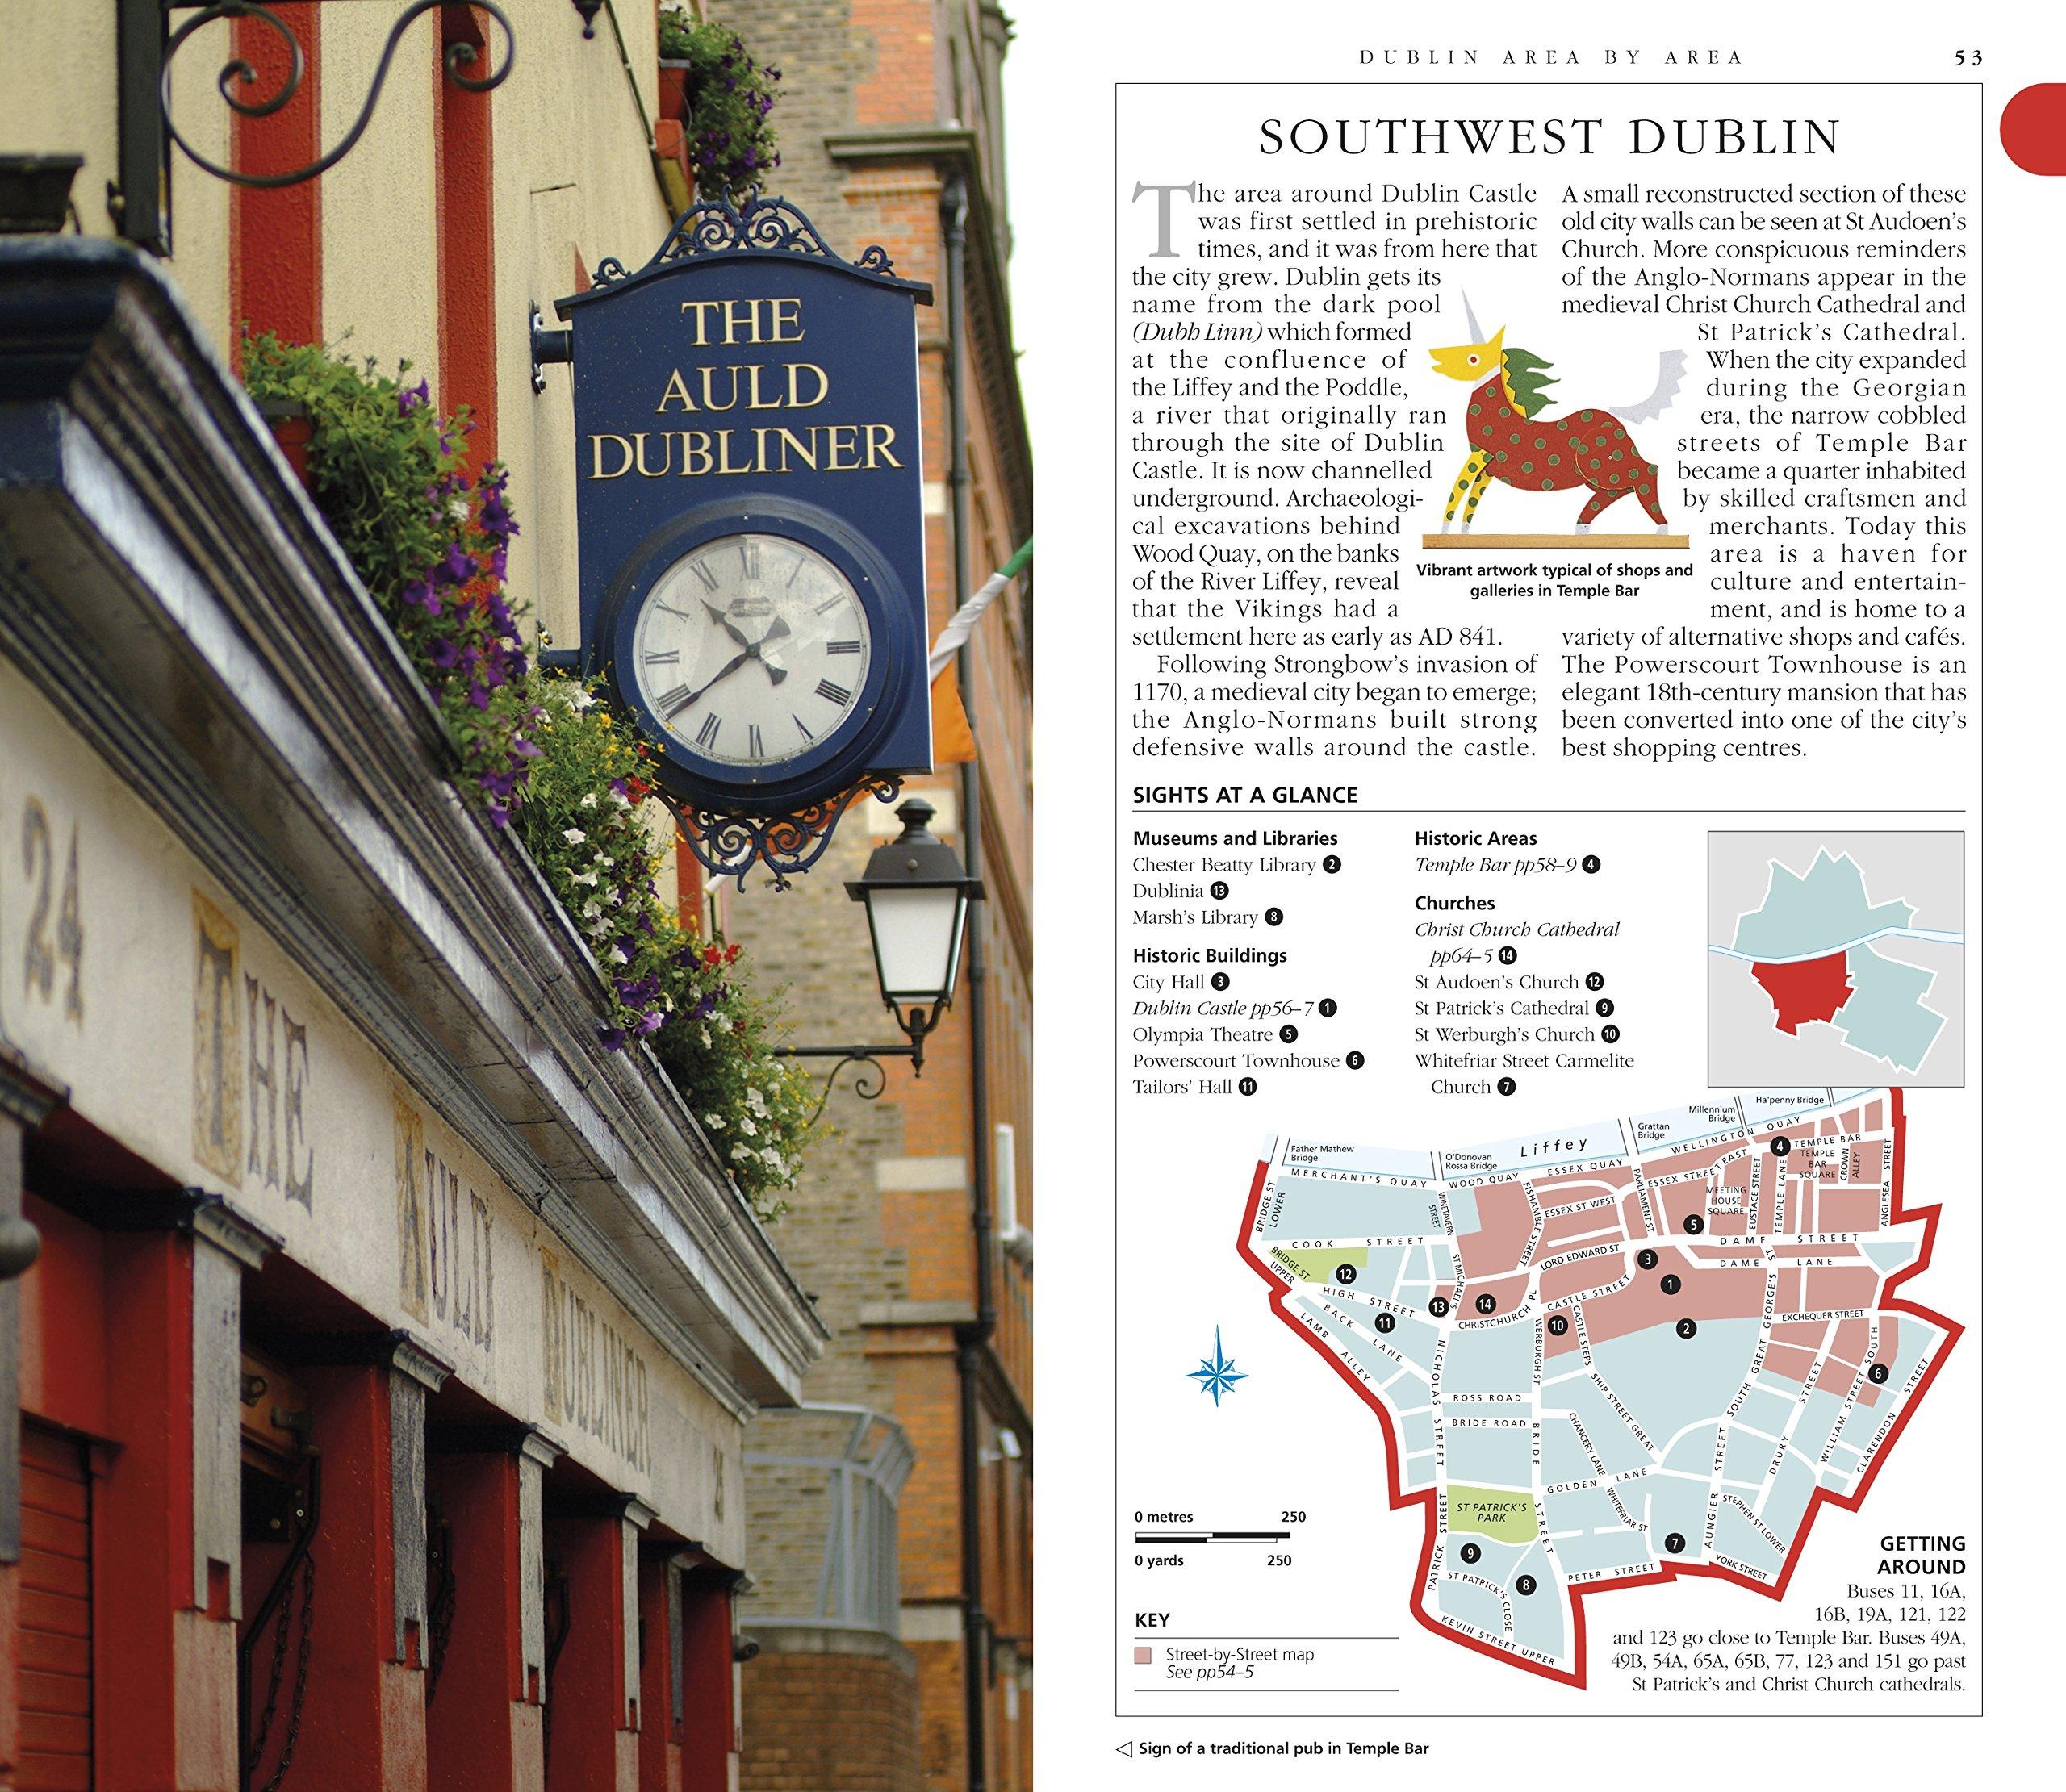 DK Eyewitness Travel Guide: Dublin: DK Publishing, Christina Park:  0690472084006: Amazon.com: Books